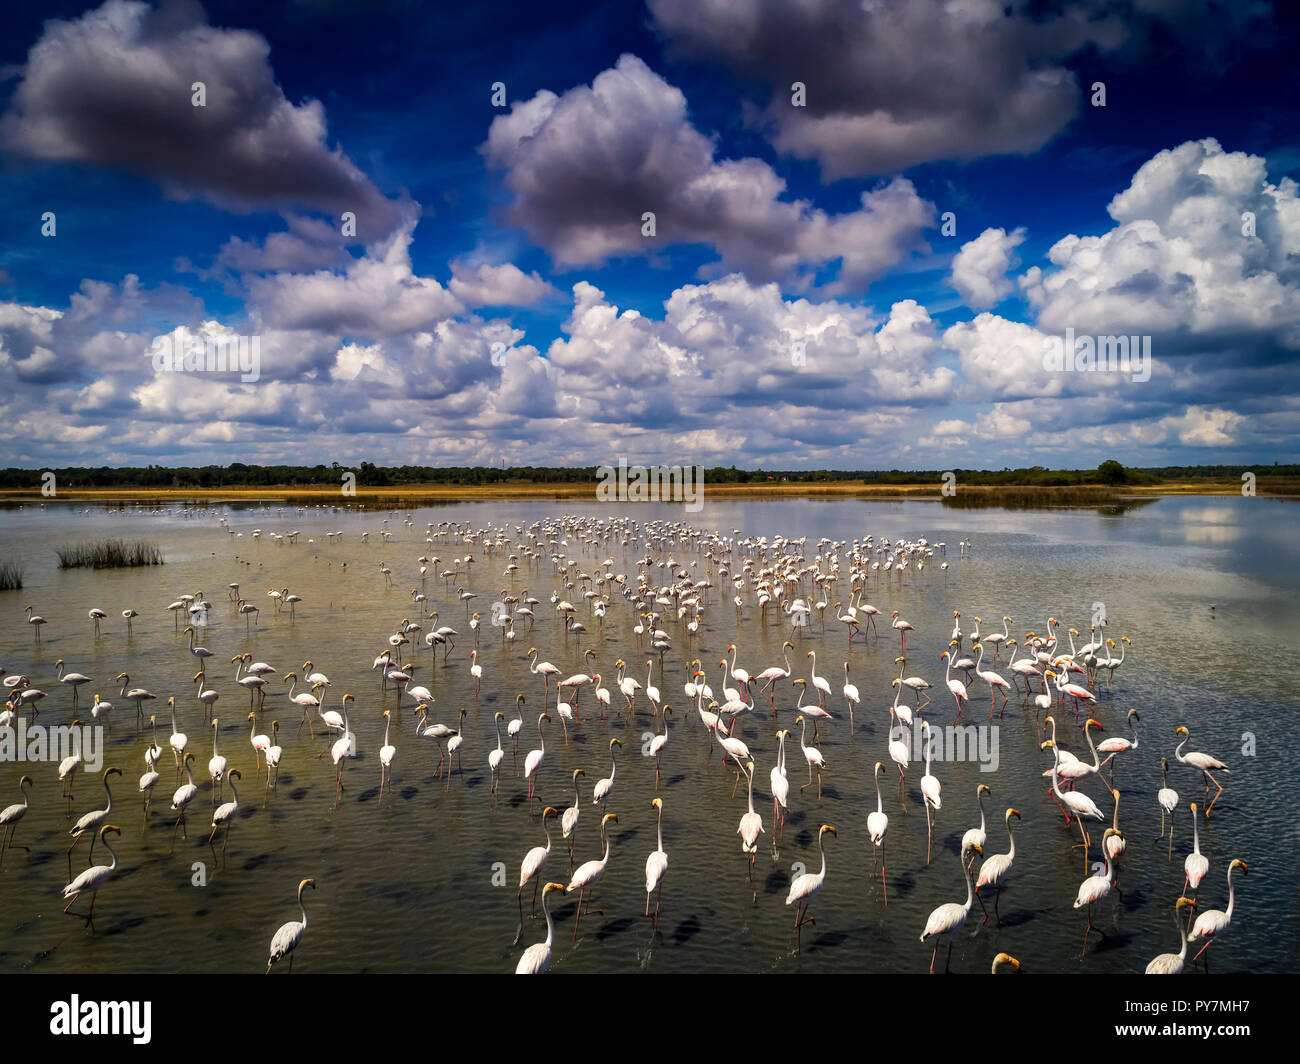 Flamingos Aerial Photograph, feeding in a lagoon in Sri Lanka - Stock Image